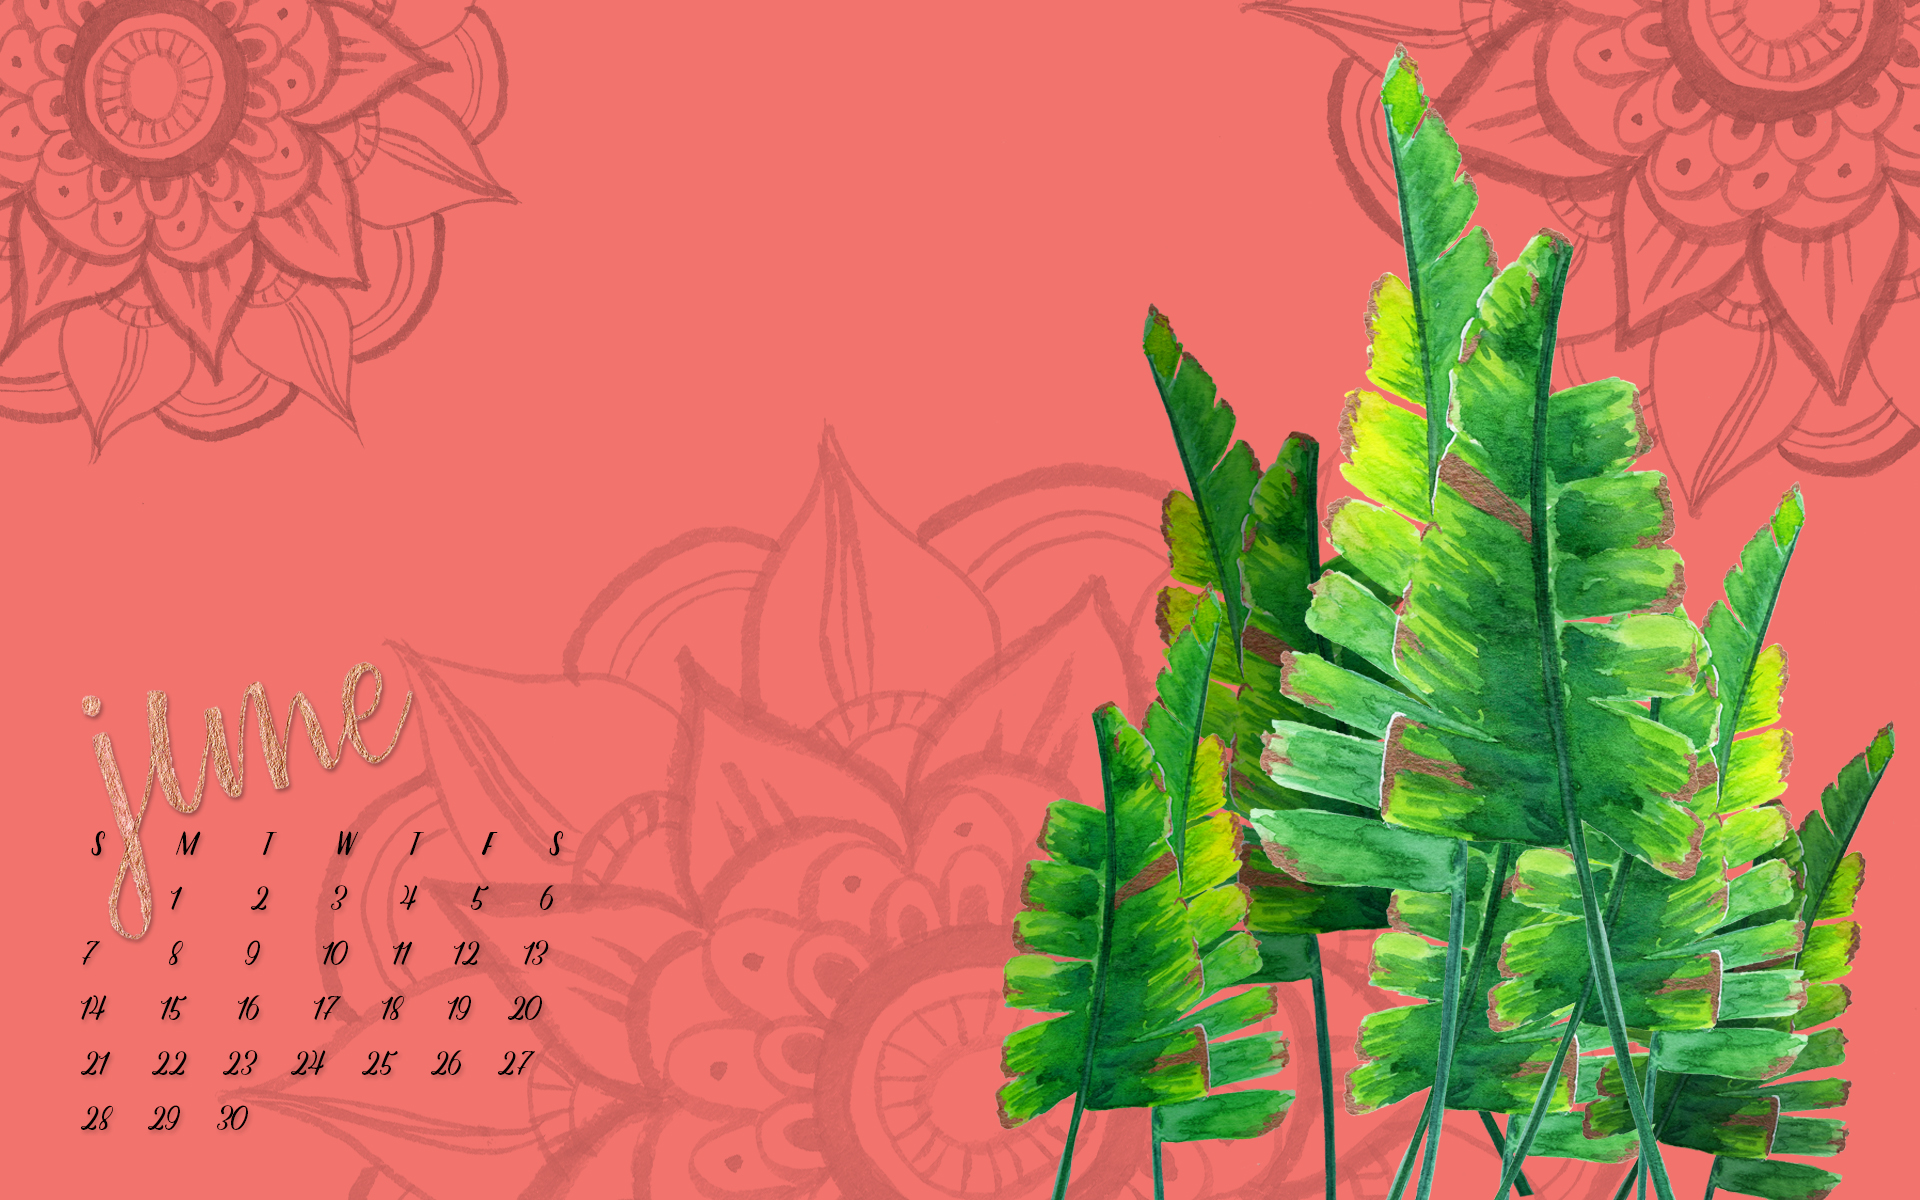 June Desktop Wallpaper - Free Download - by Daughter Zion Designs